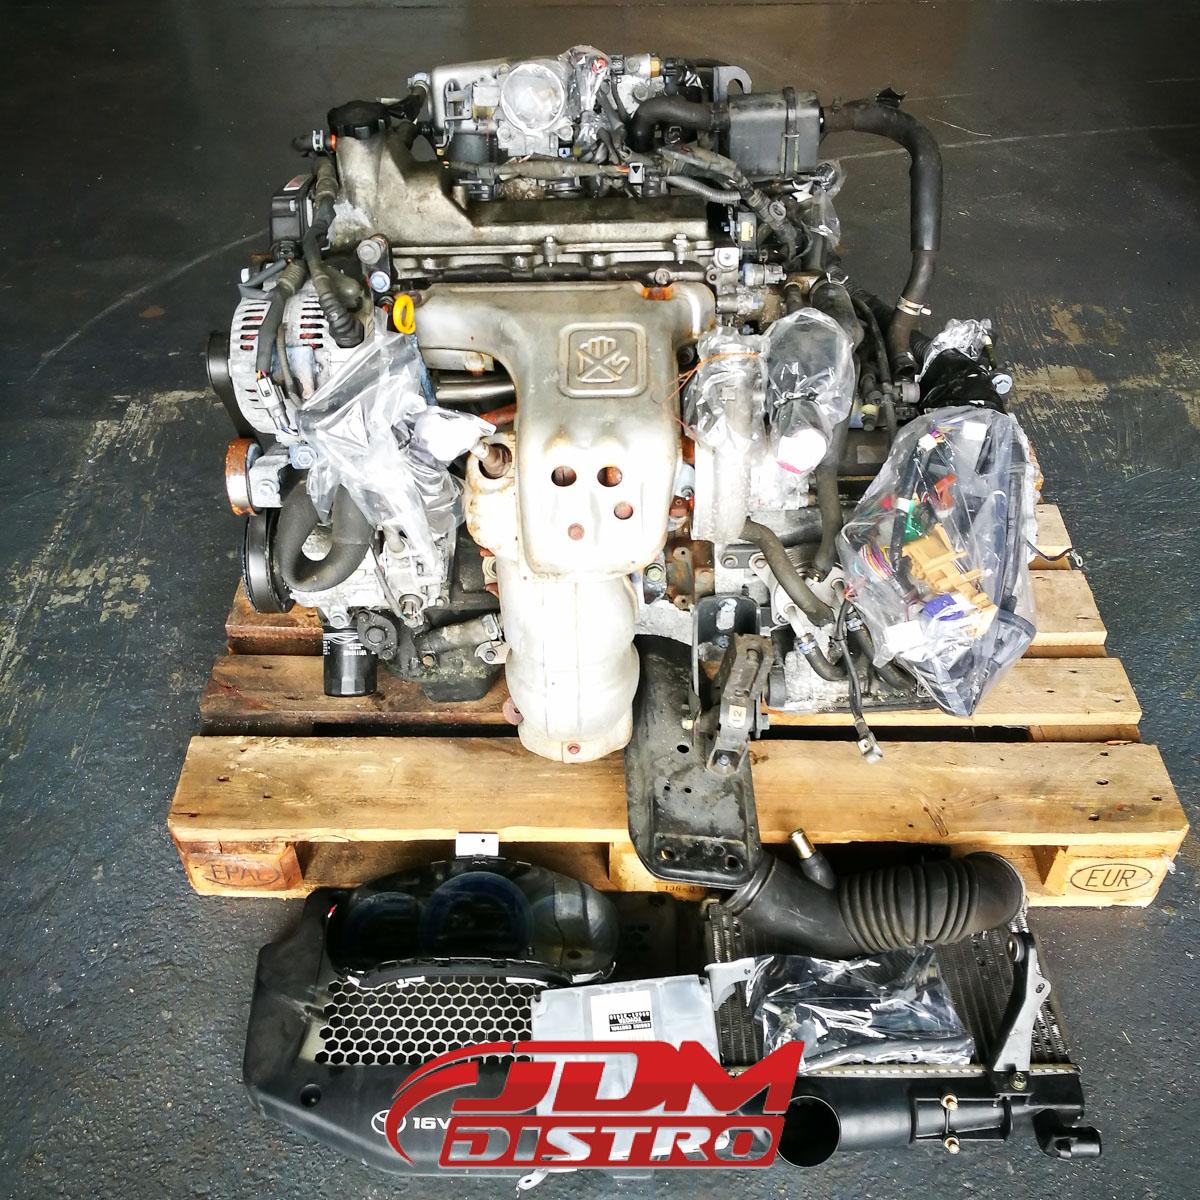 TOYOTA CELICA / CALDINA GT4 ST246W 3SGTE ENGINE & GEARBOX